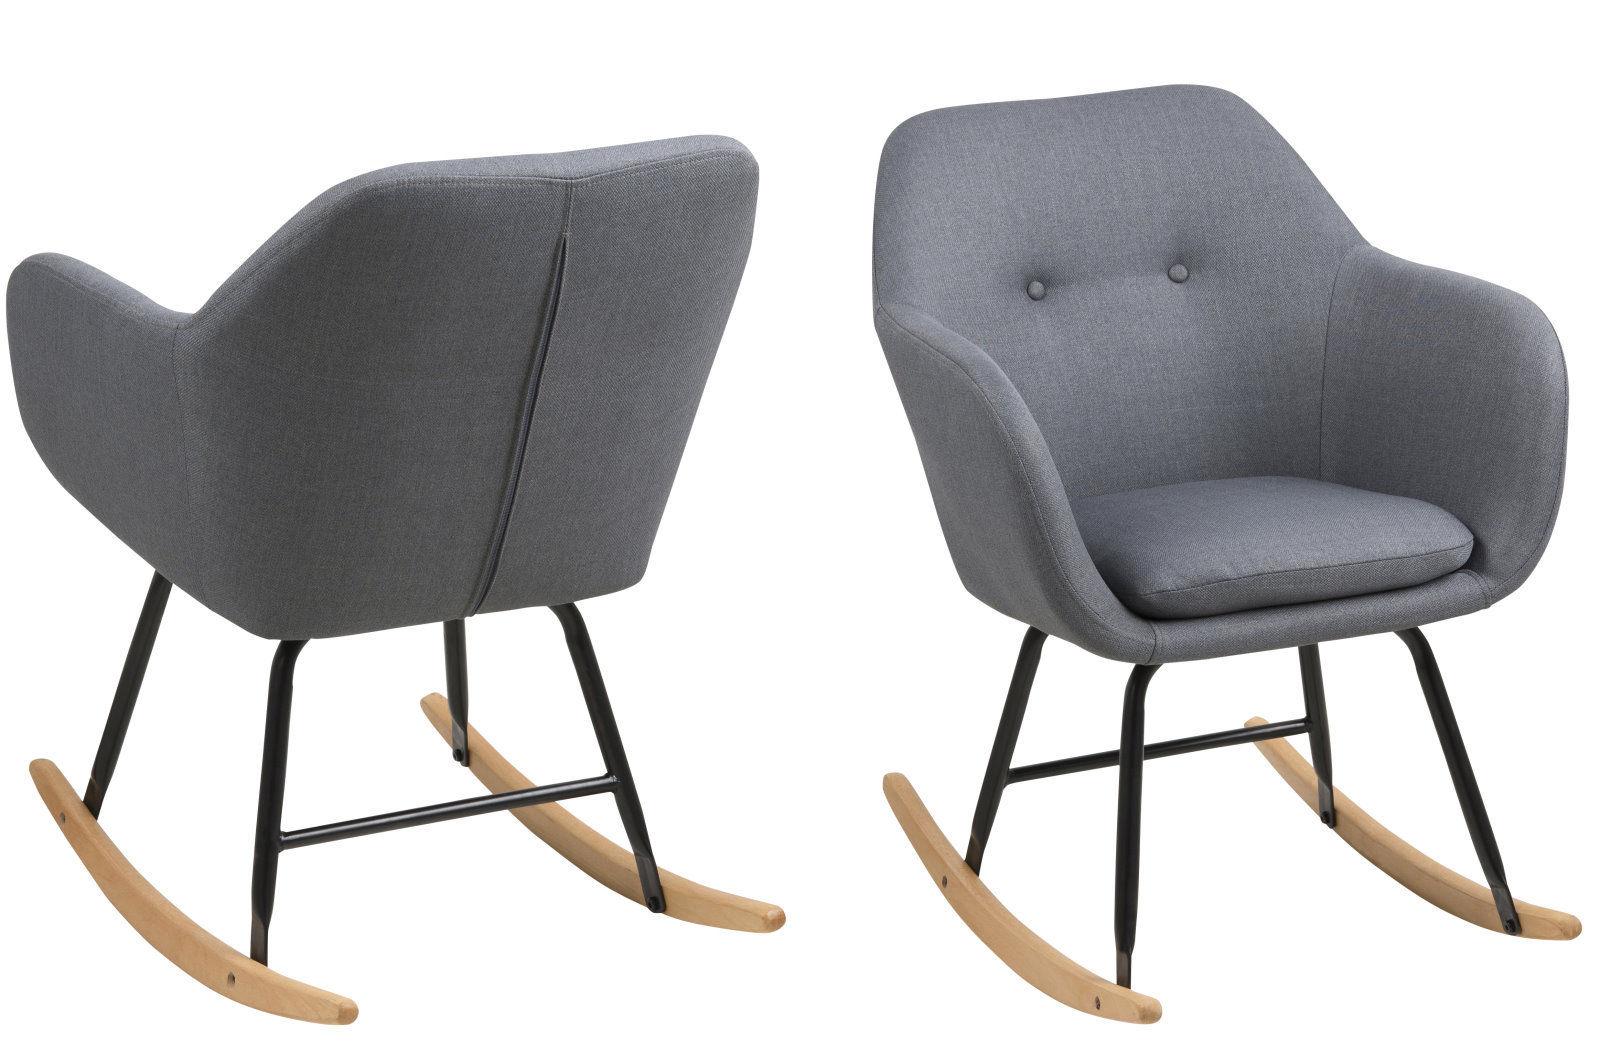 pklline schaukelstuhl in grau schwingstuhl ruhesessel. Black Bedroom Furniture Sets. Home Design Ideas